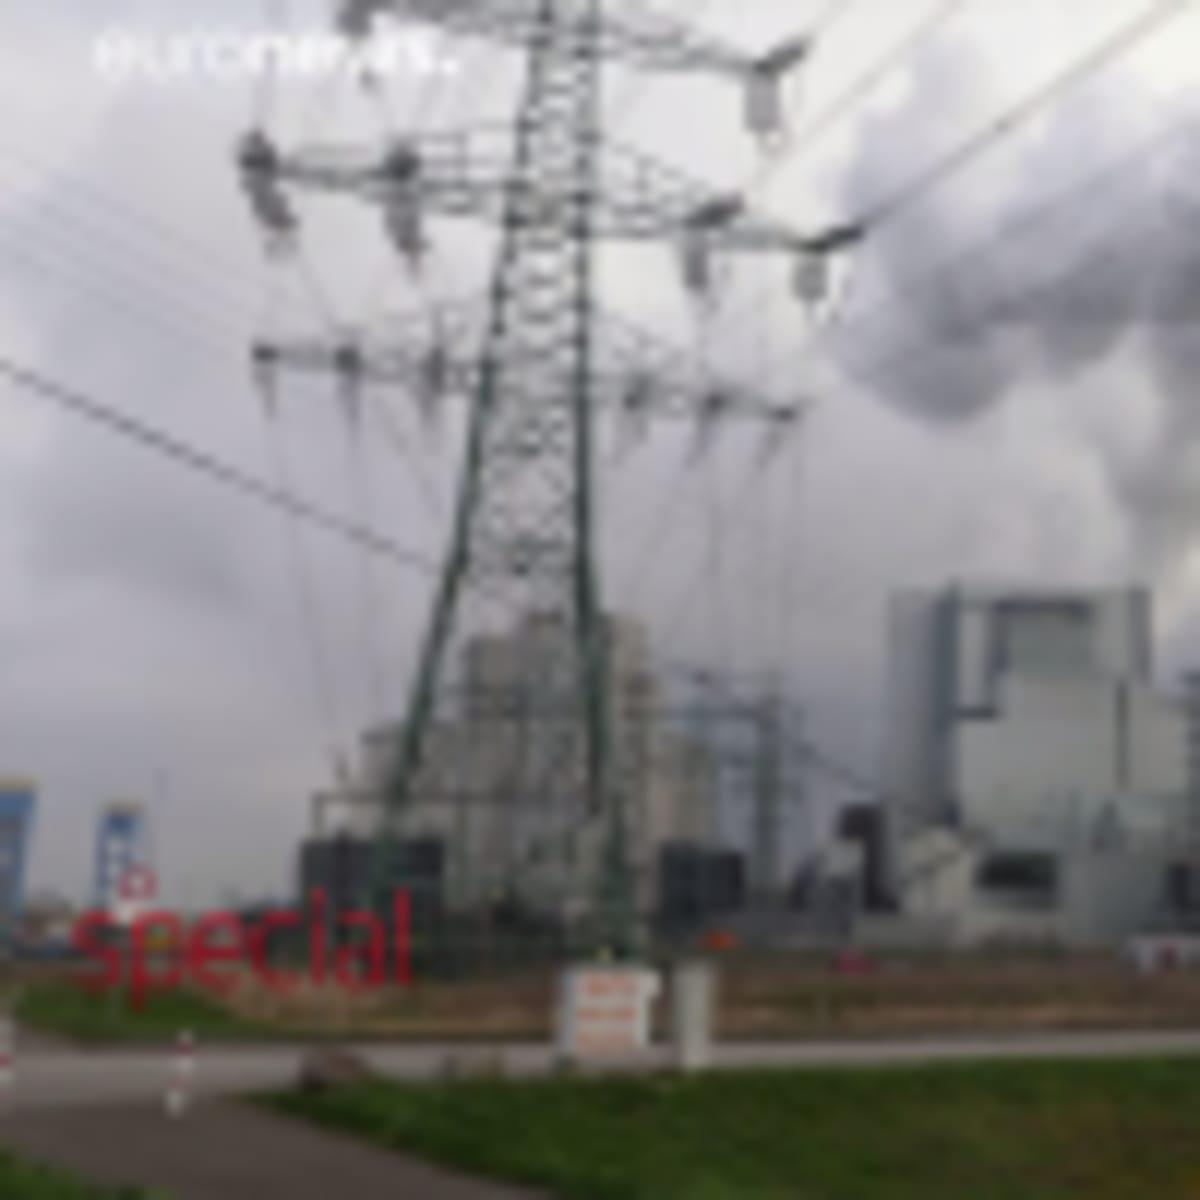 A brokdorfi atomerőmű végnapjai | ClimeNews